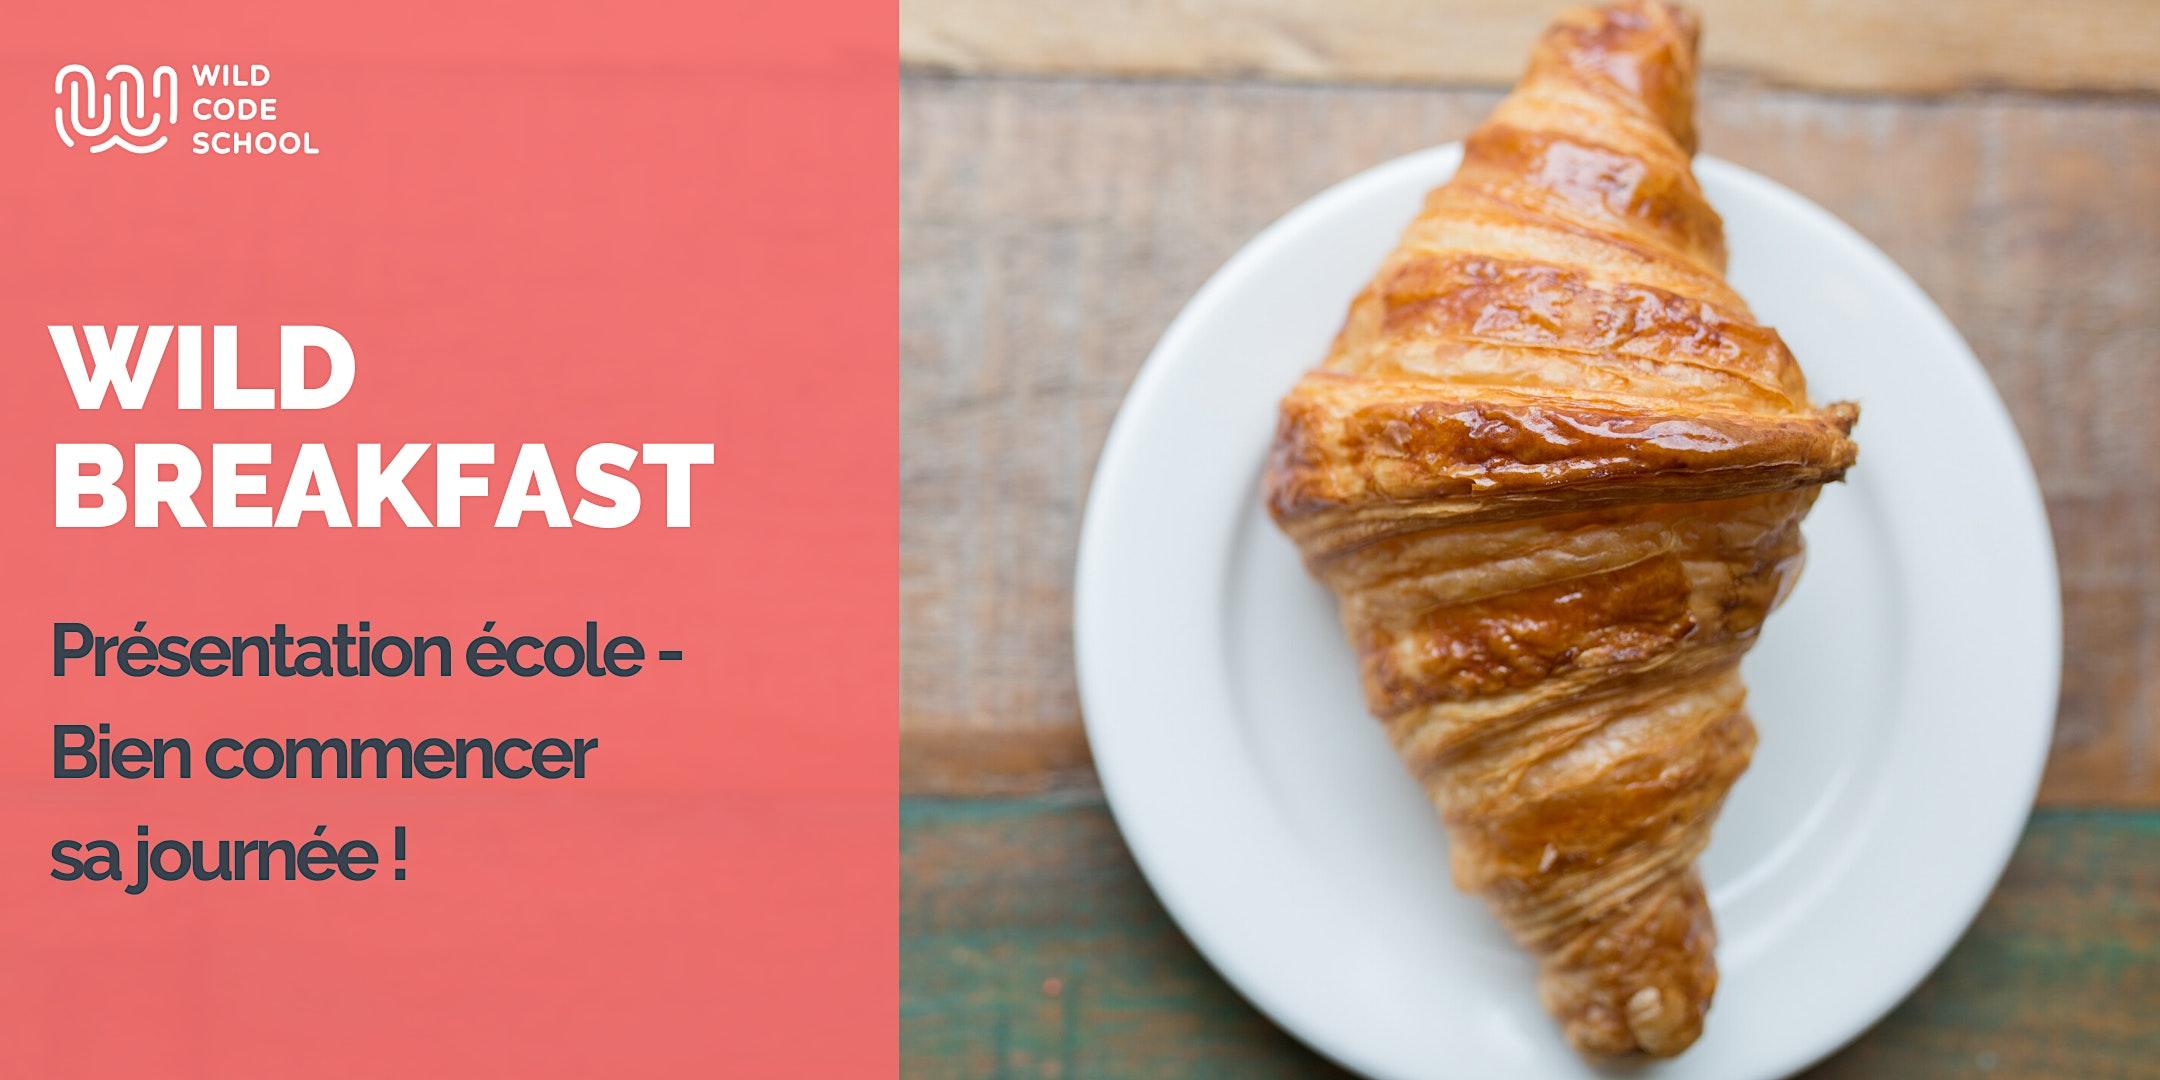 Wild Breakfast en Visio - Présentation Ecole